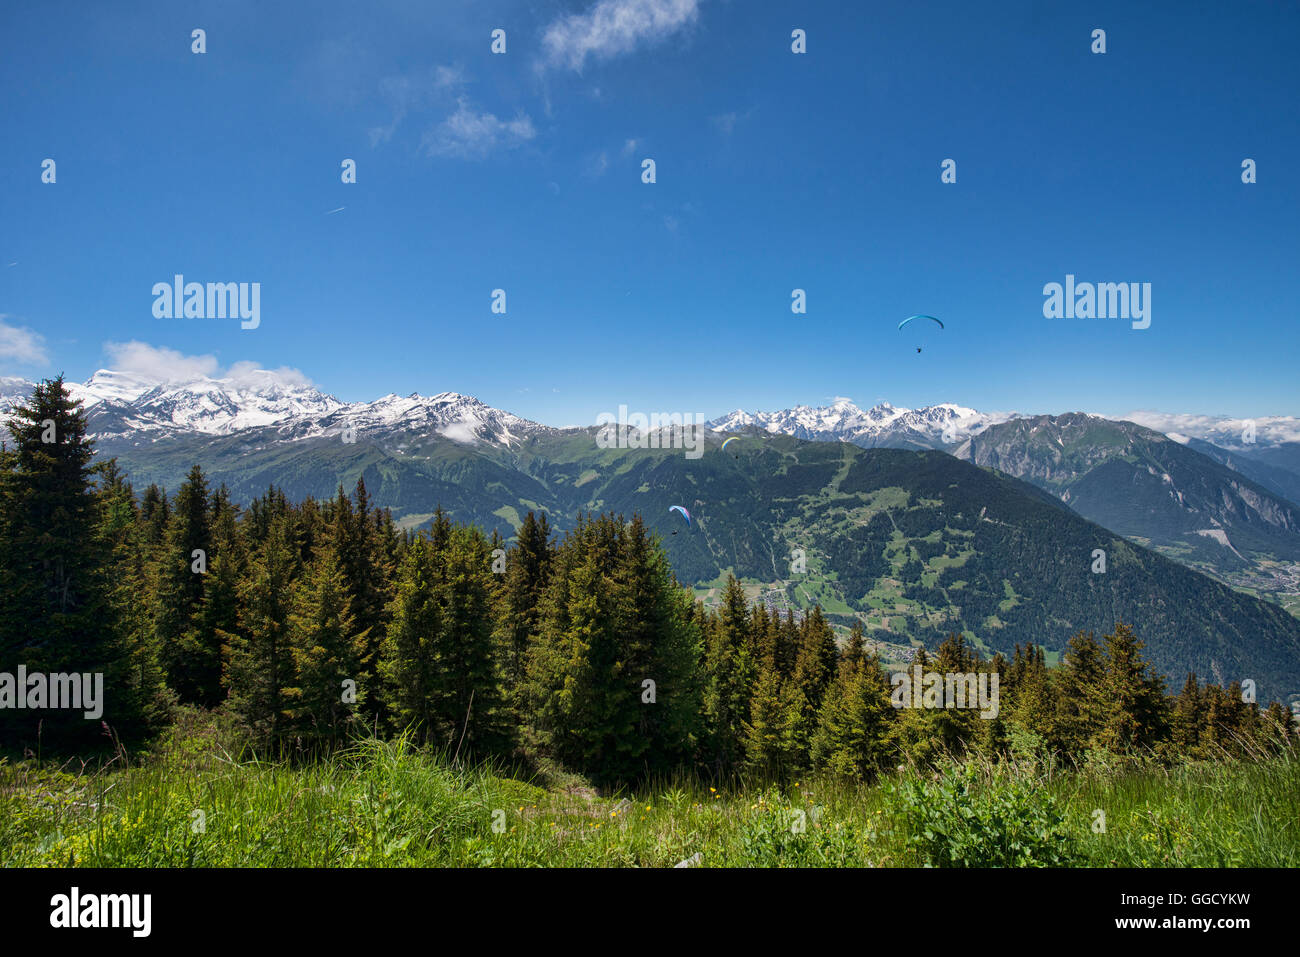 Parasailing over the Grand Combin and Val de Bagnes, Verbier, Switzerland - Stock Image